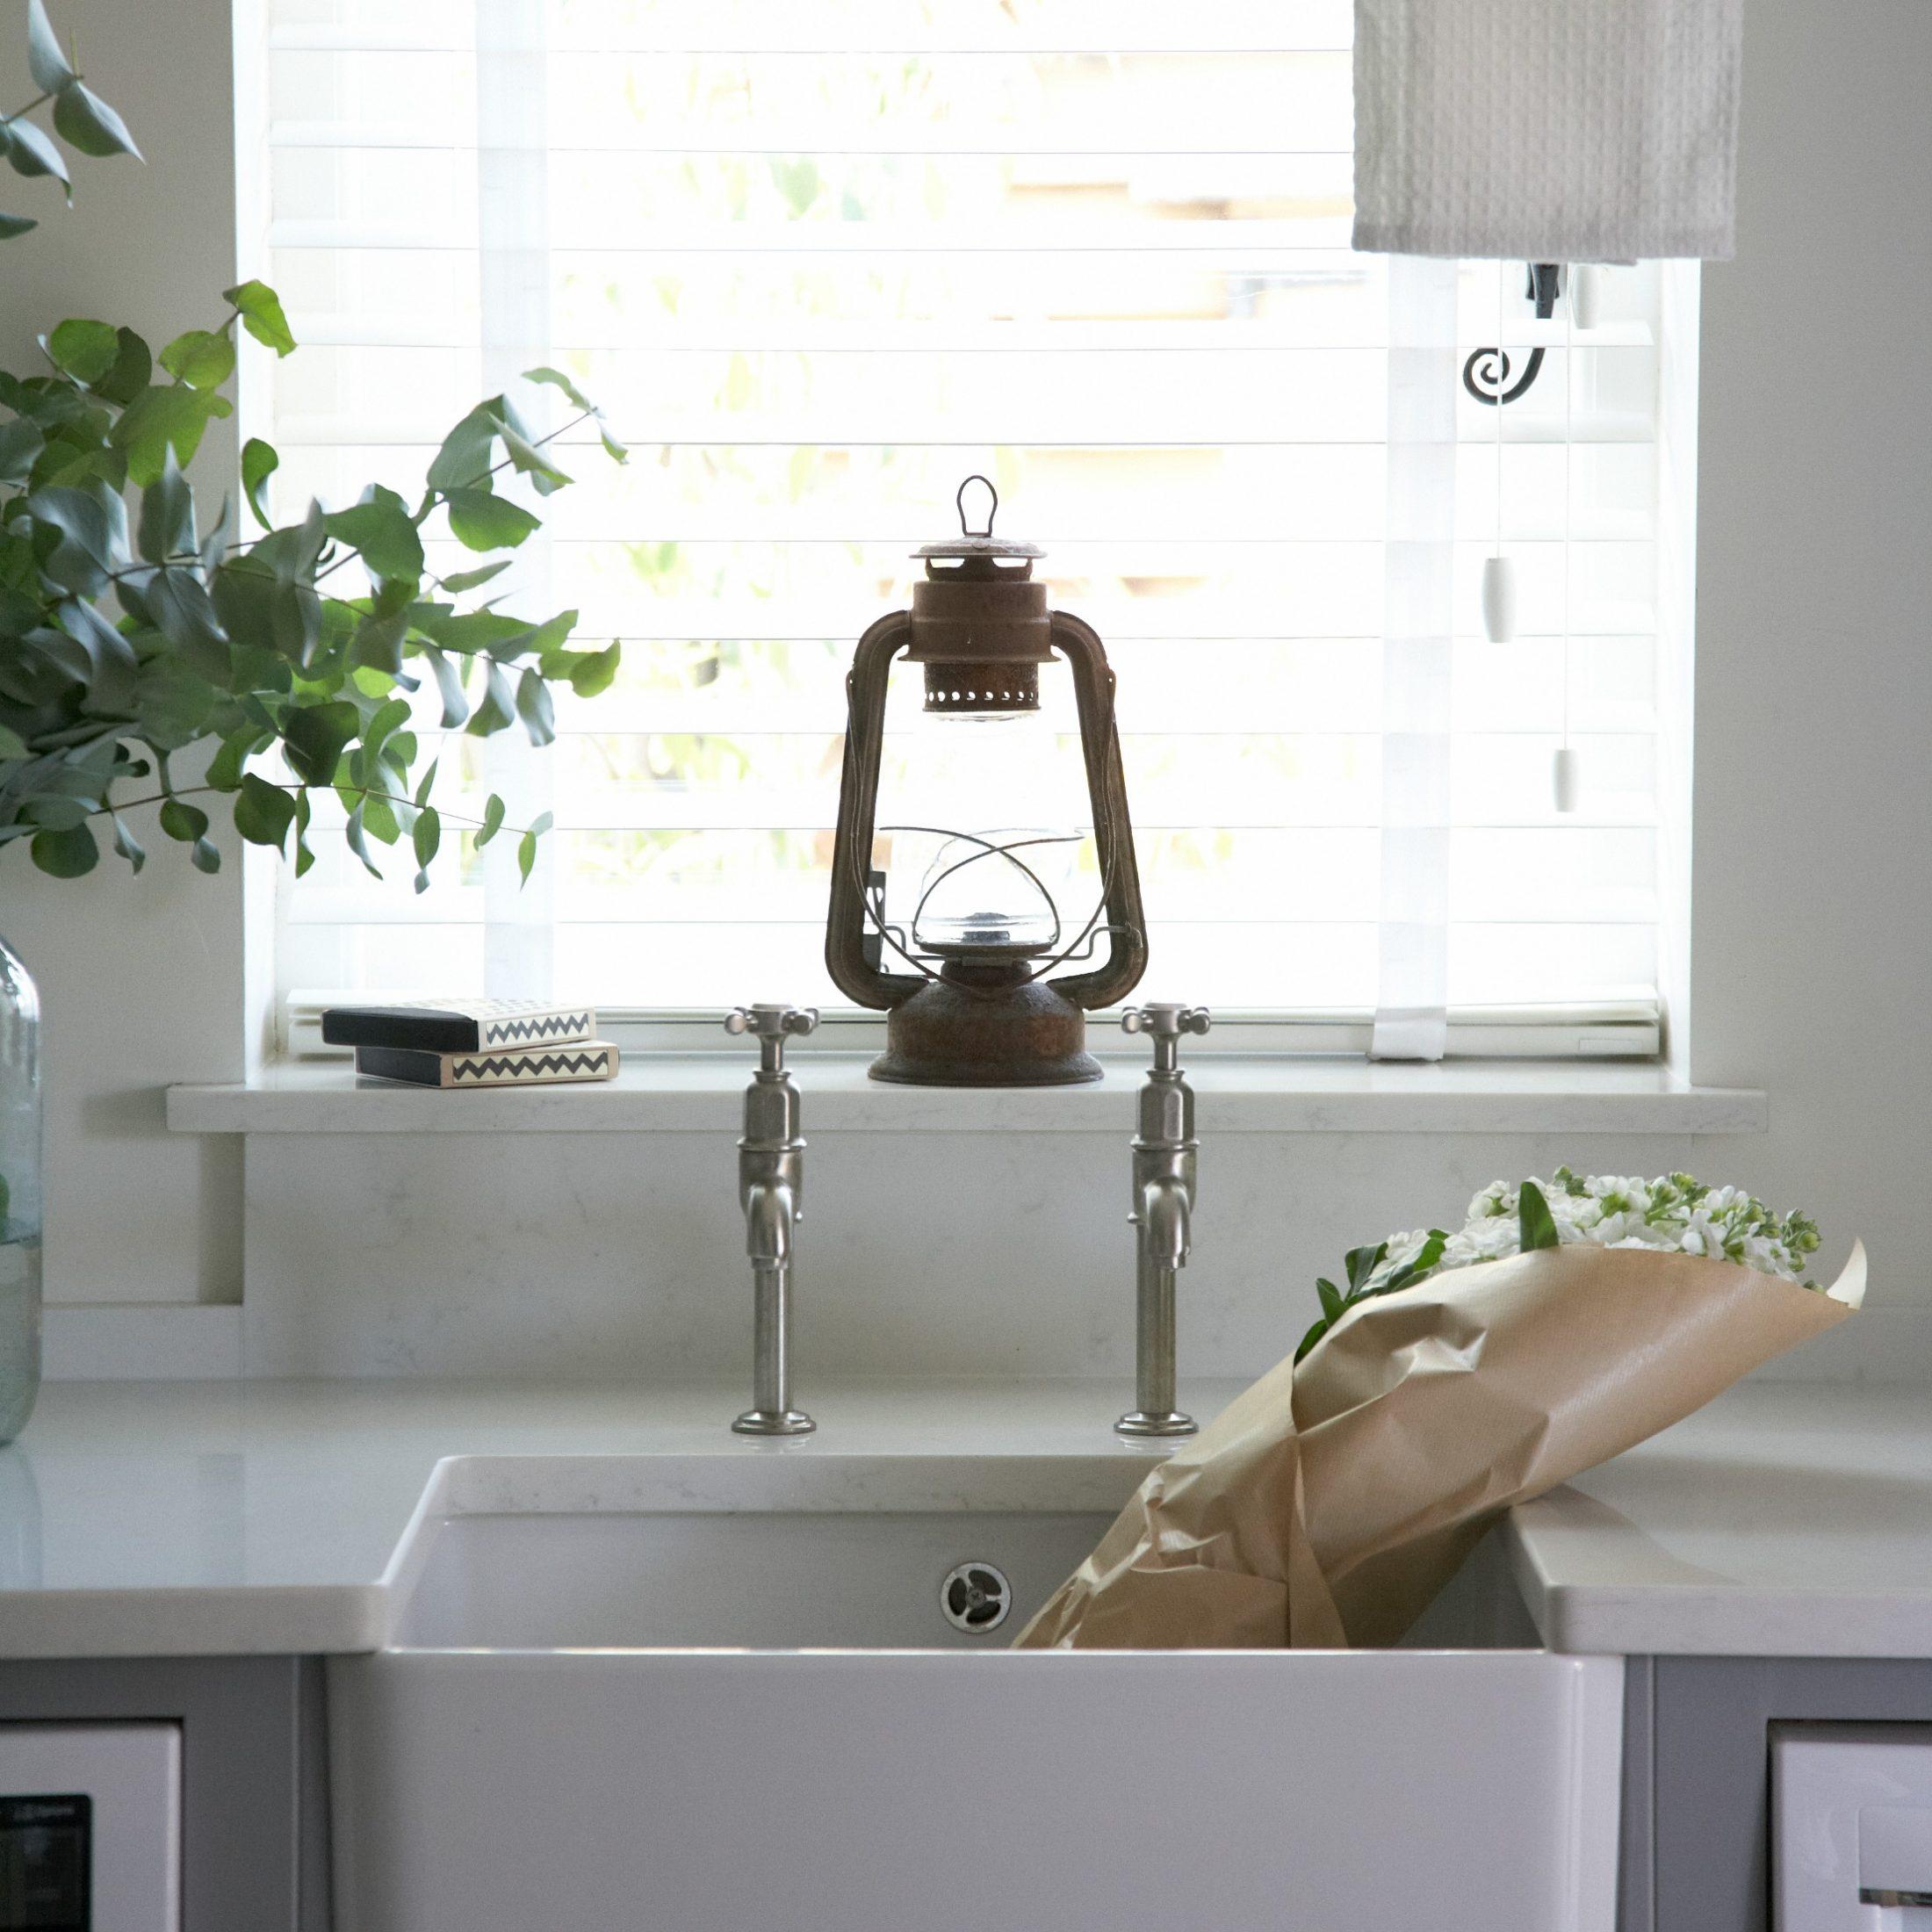 Mulberry Cottage- Utility Room Ideas - Humphrey Munson